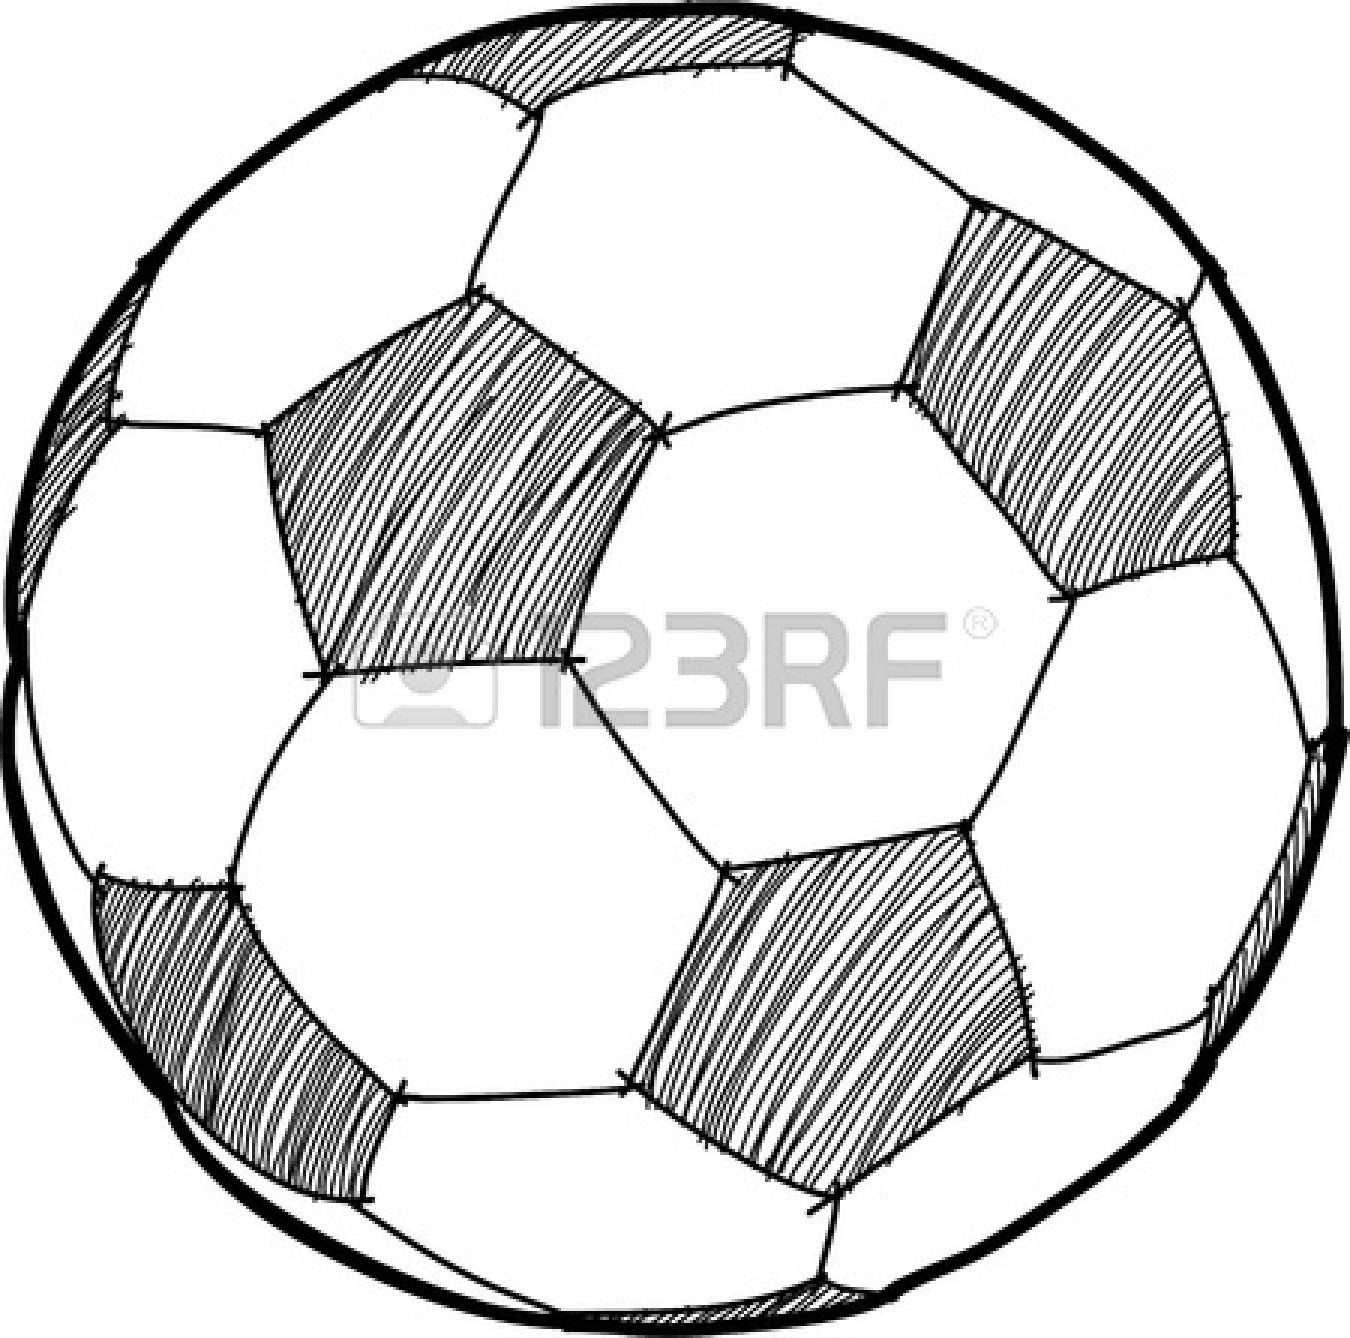 1350x1338 Drawn Ball Football Net